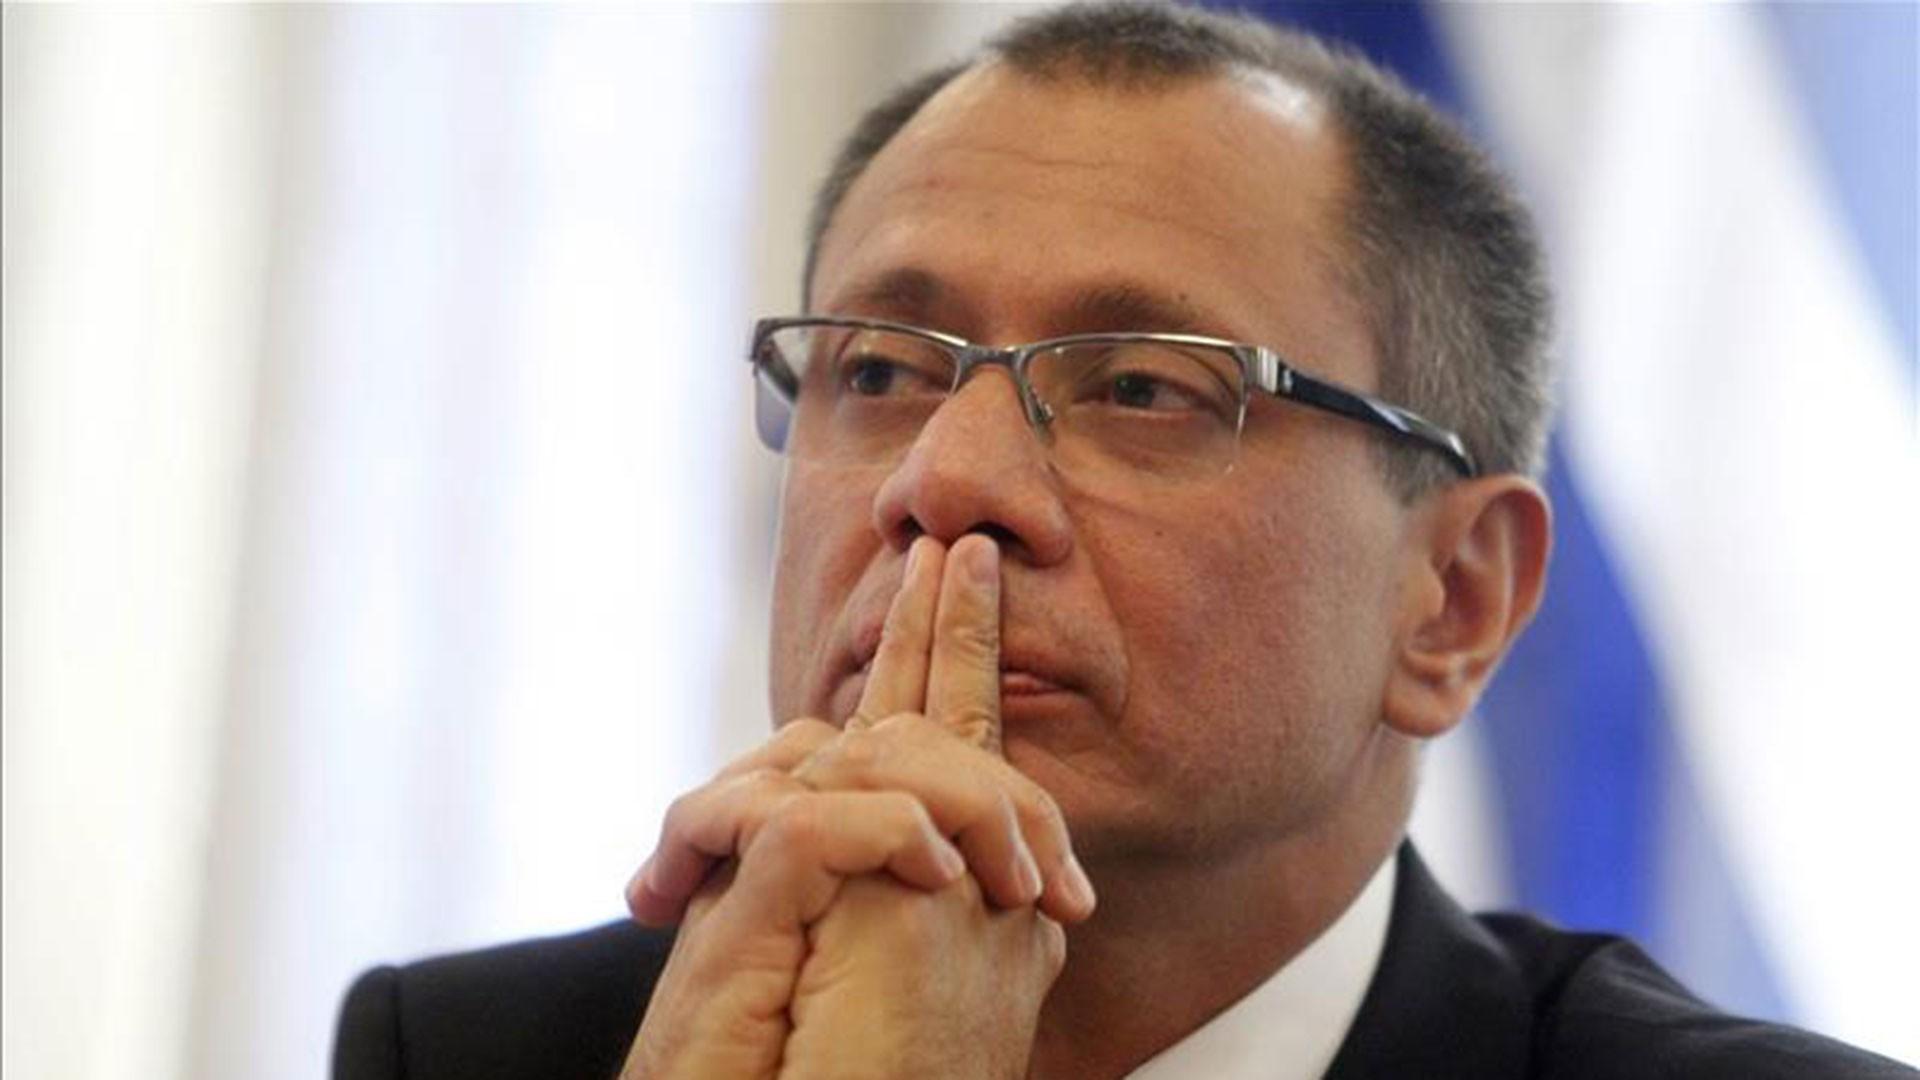 ВЭквадоре суд выдал ордер наарест вице-президента